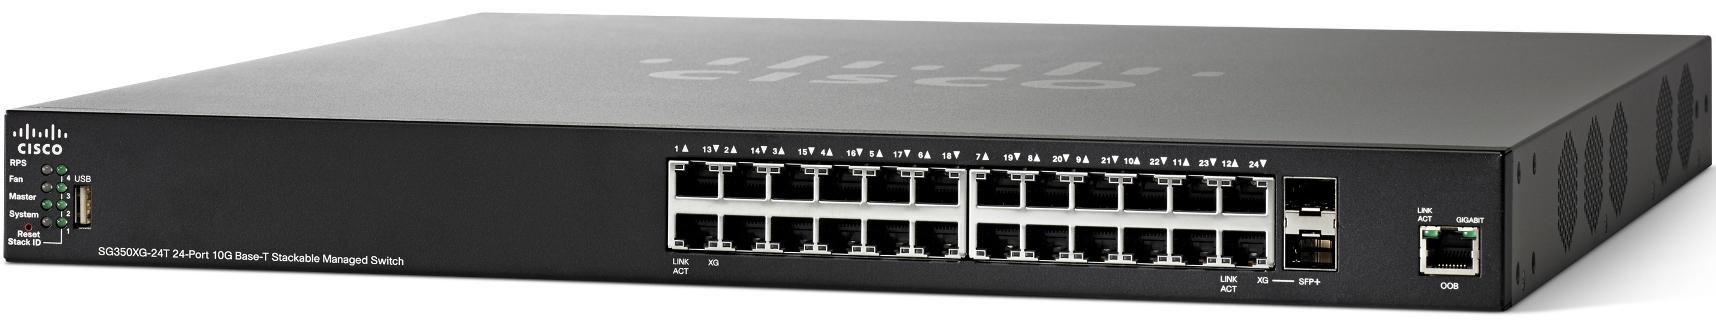 Cisco SG350XG-24T Managed Switch